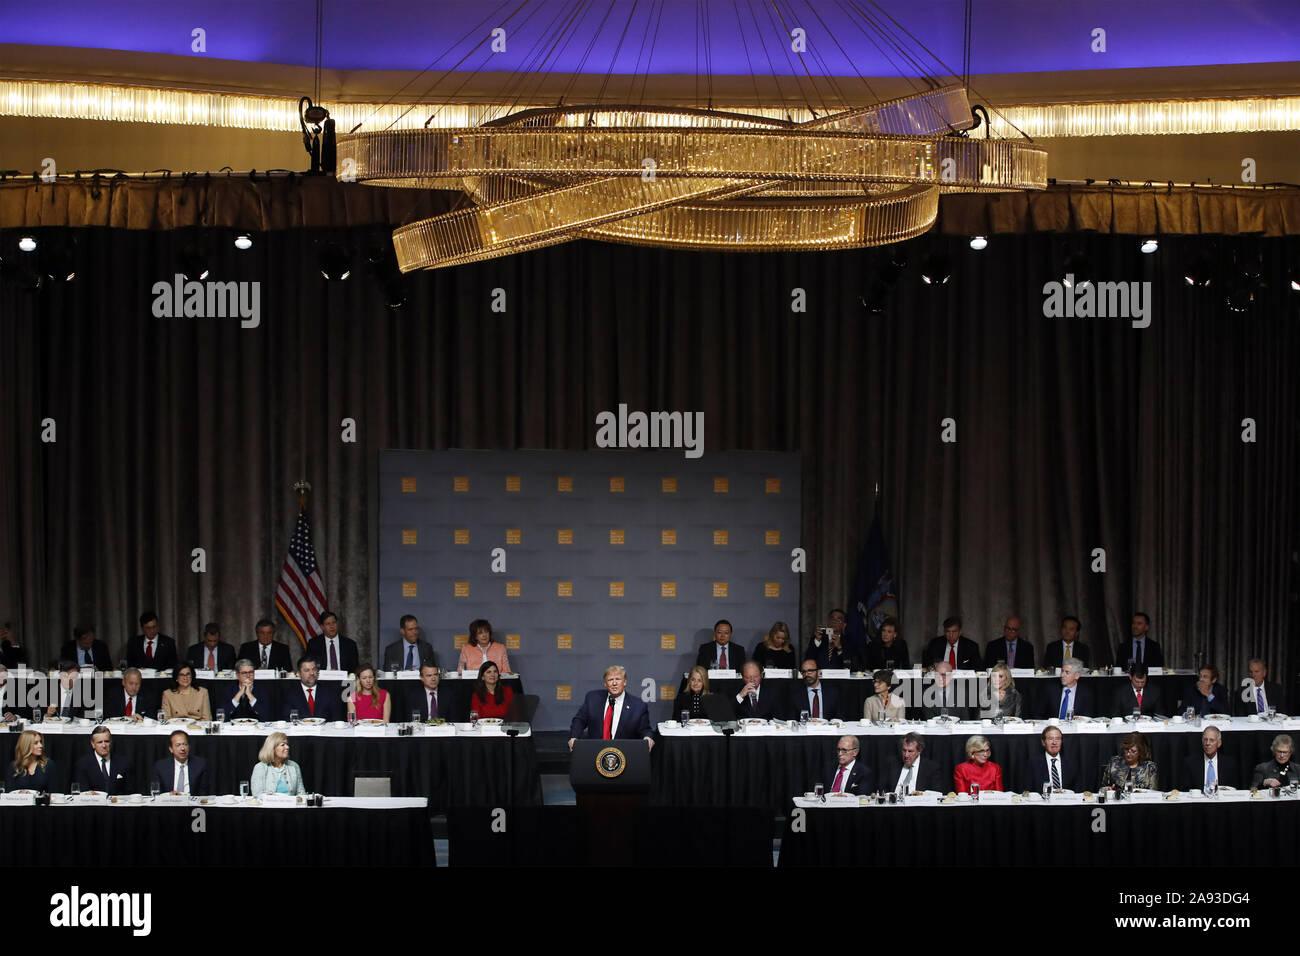 New York, USA. 12th Nov, 2019. President Donald Trump speaks at the Economic Club of New York Luncheon on Tuesday, November 12, 2019 at the New York Midtown Hilton in New York City. Photo by Jason Szenes/UPI Credit: UPI/Alamy Live News Stock Photo